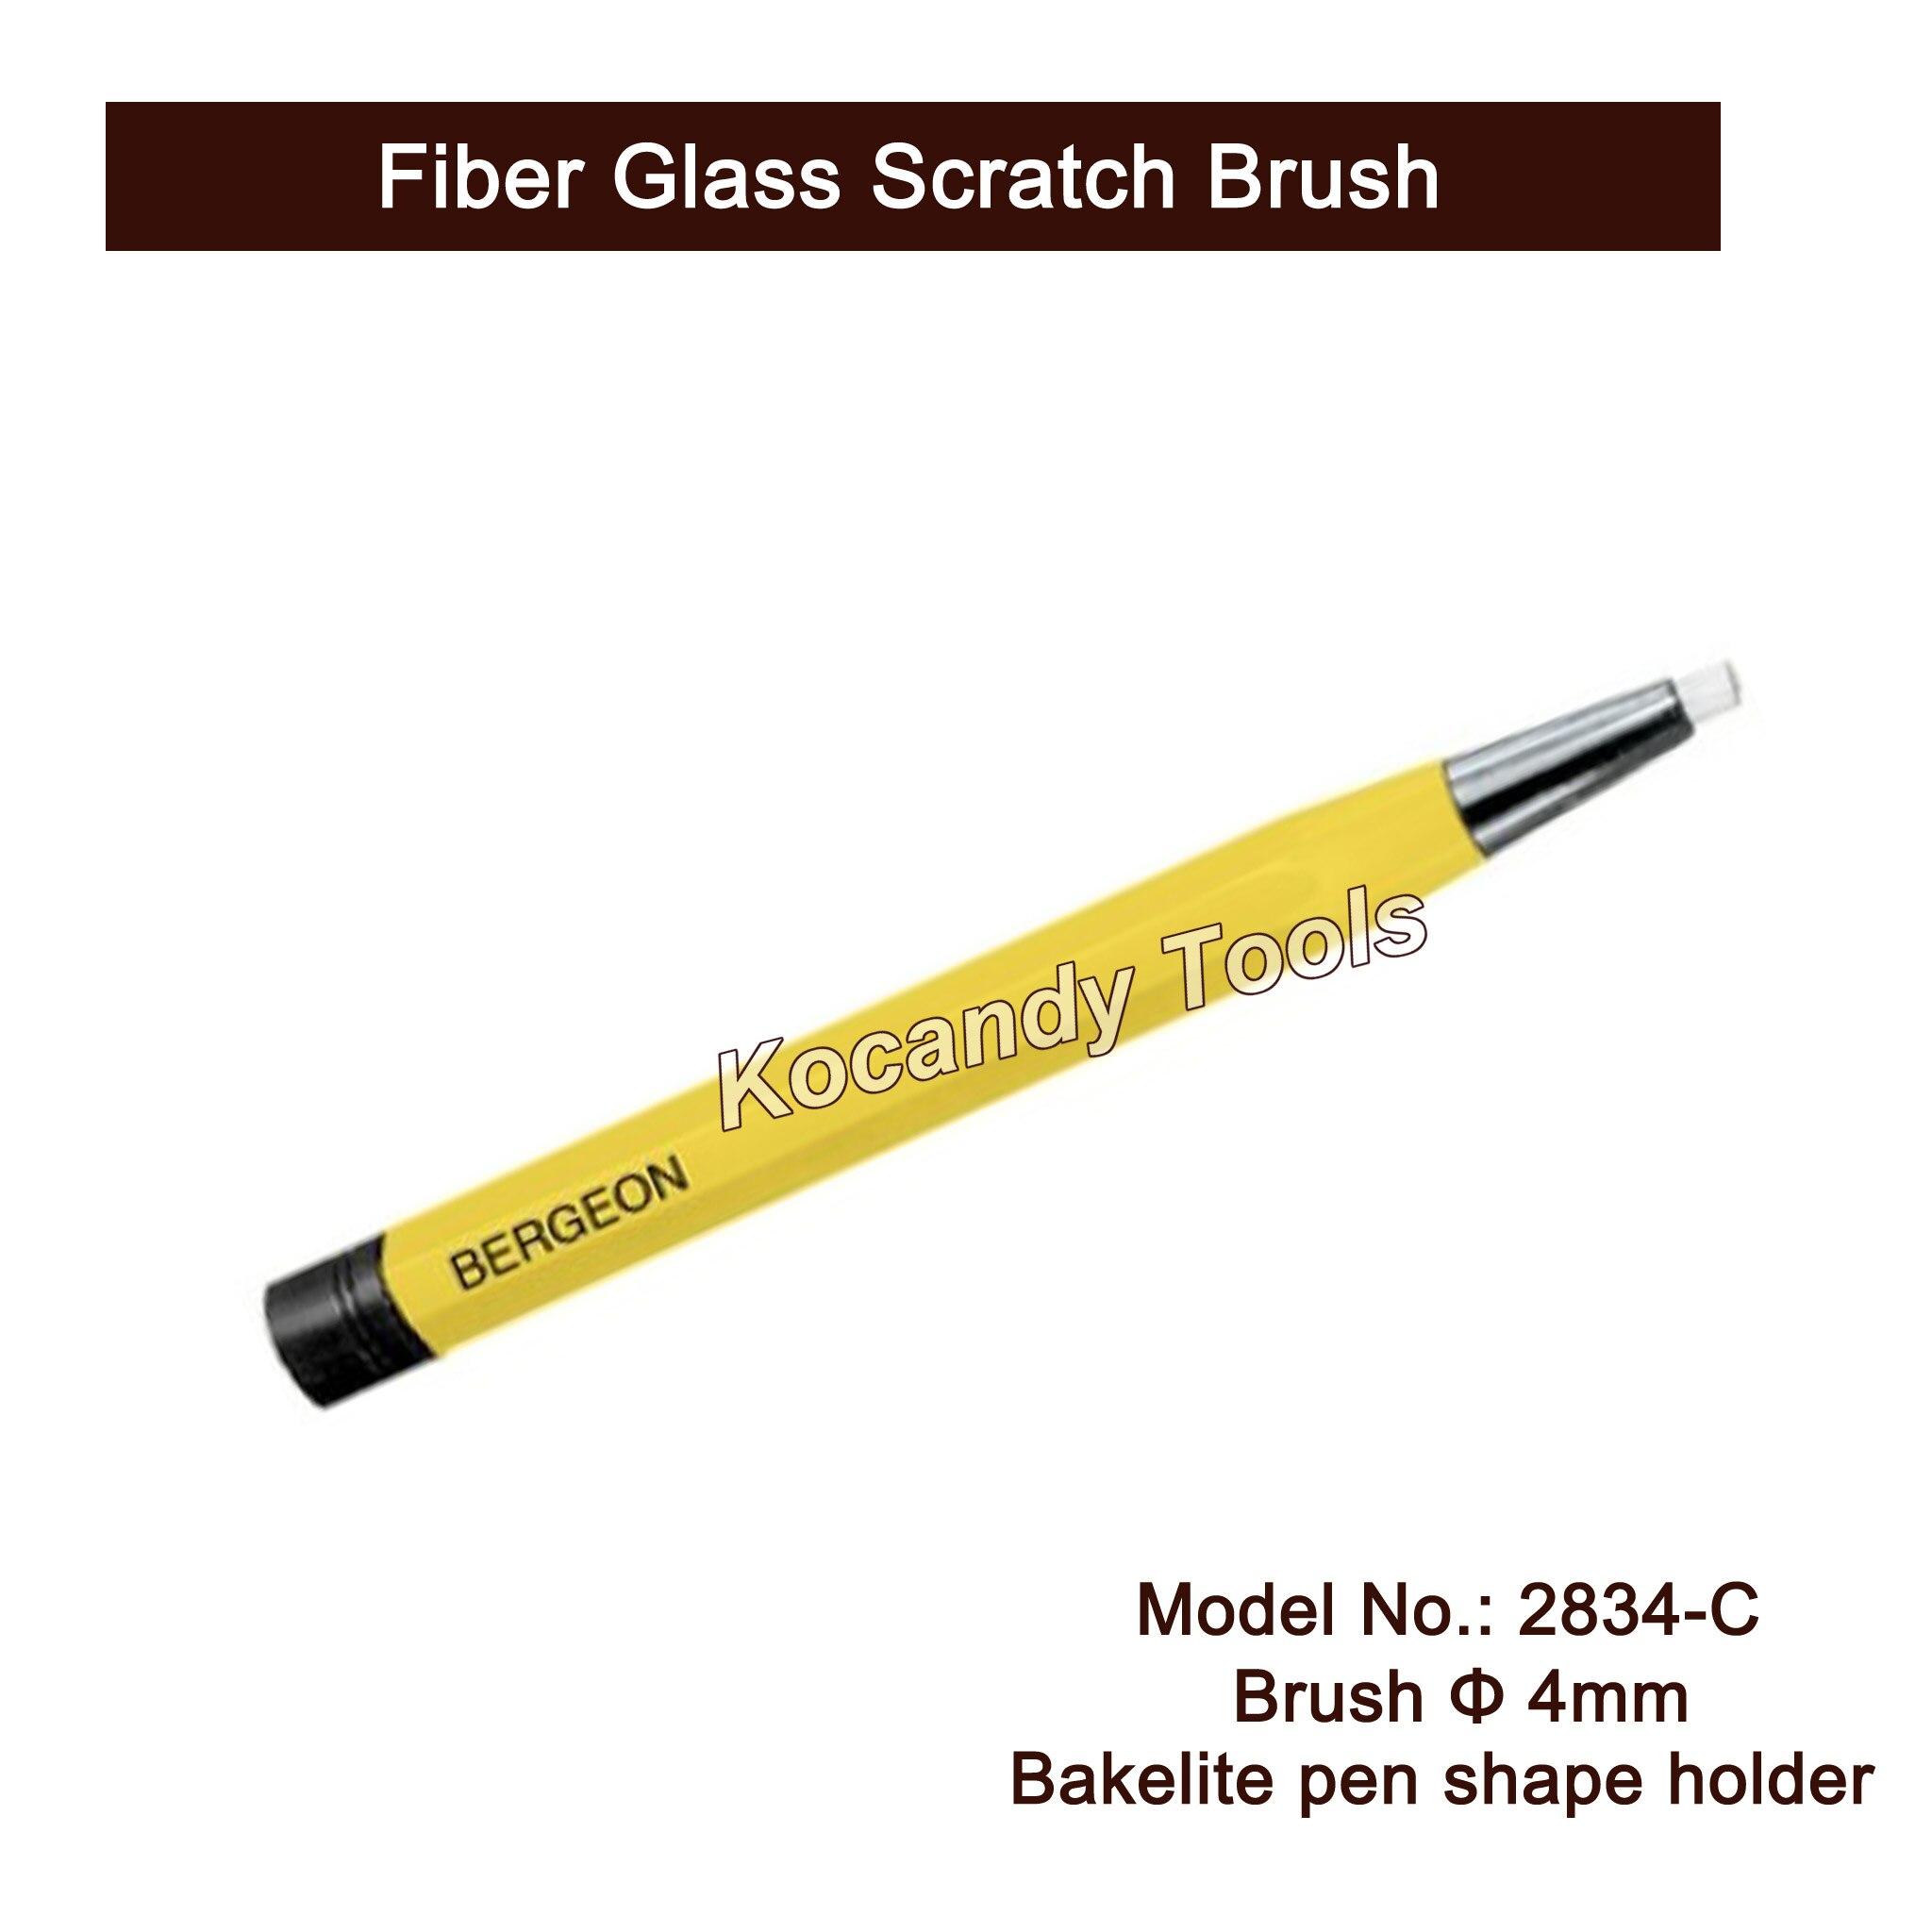 No.2834-C بيرجيون الألياف الزجاجية خدش فرشاة القلم شكل لساعة Scrach أداة إزالة